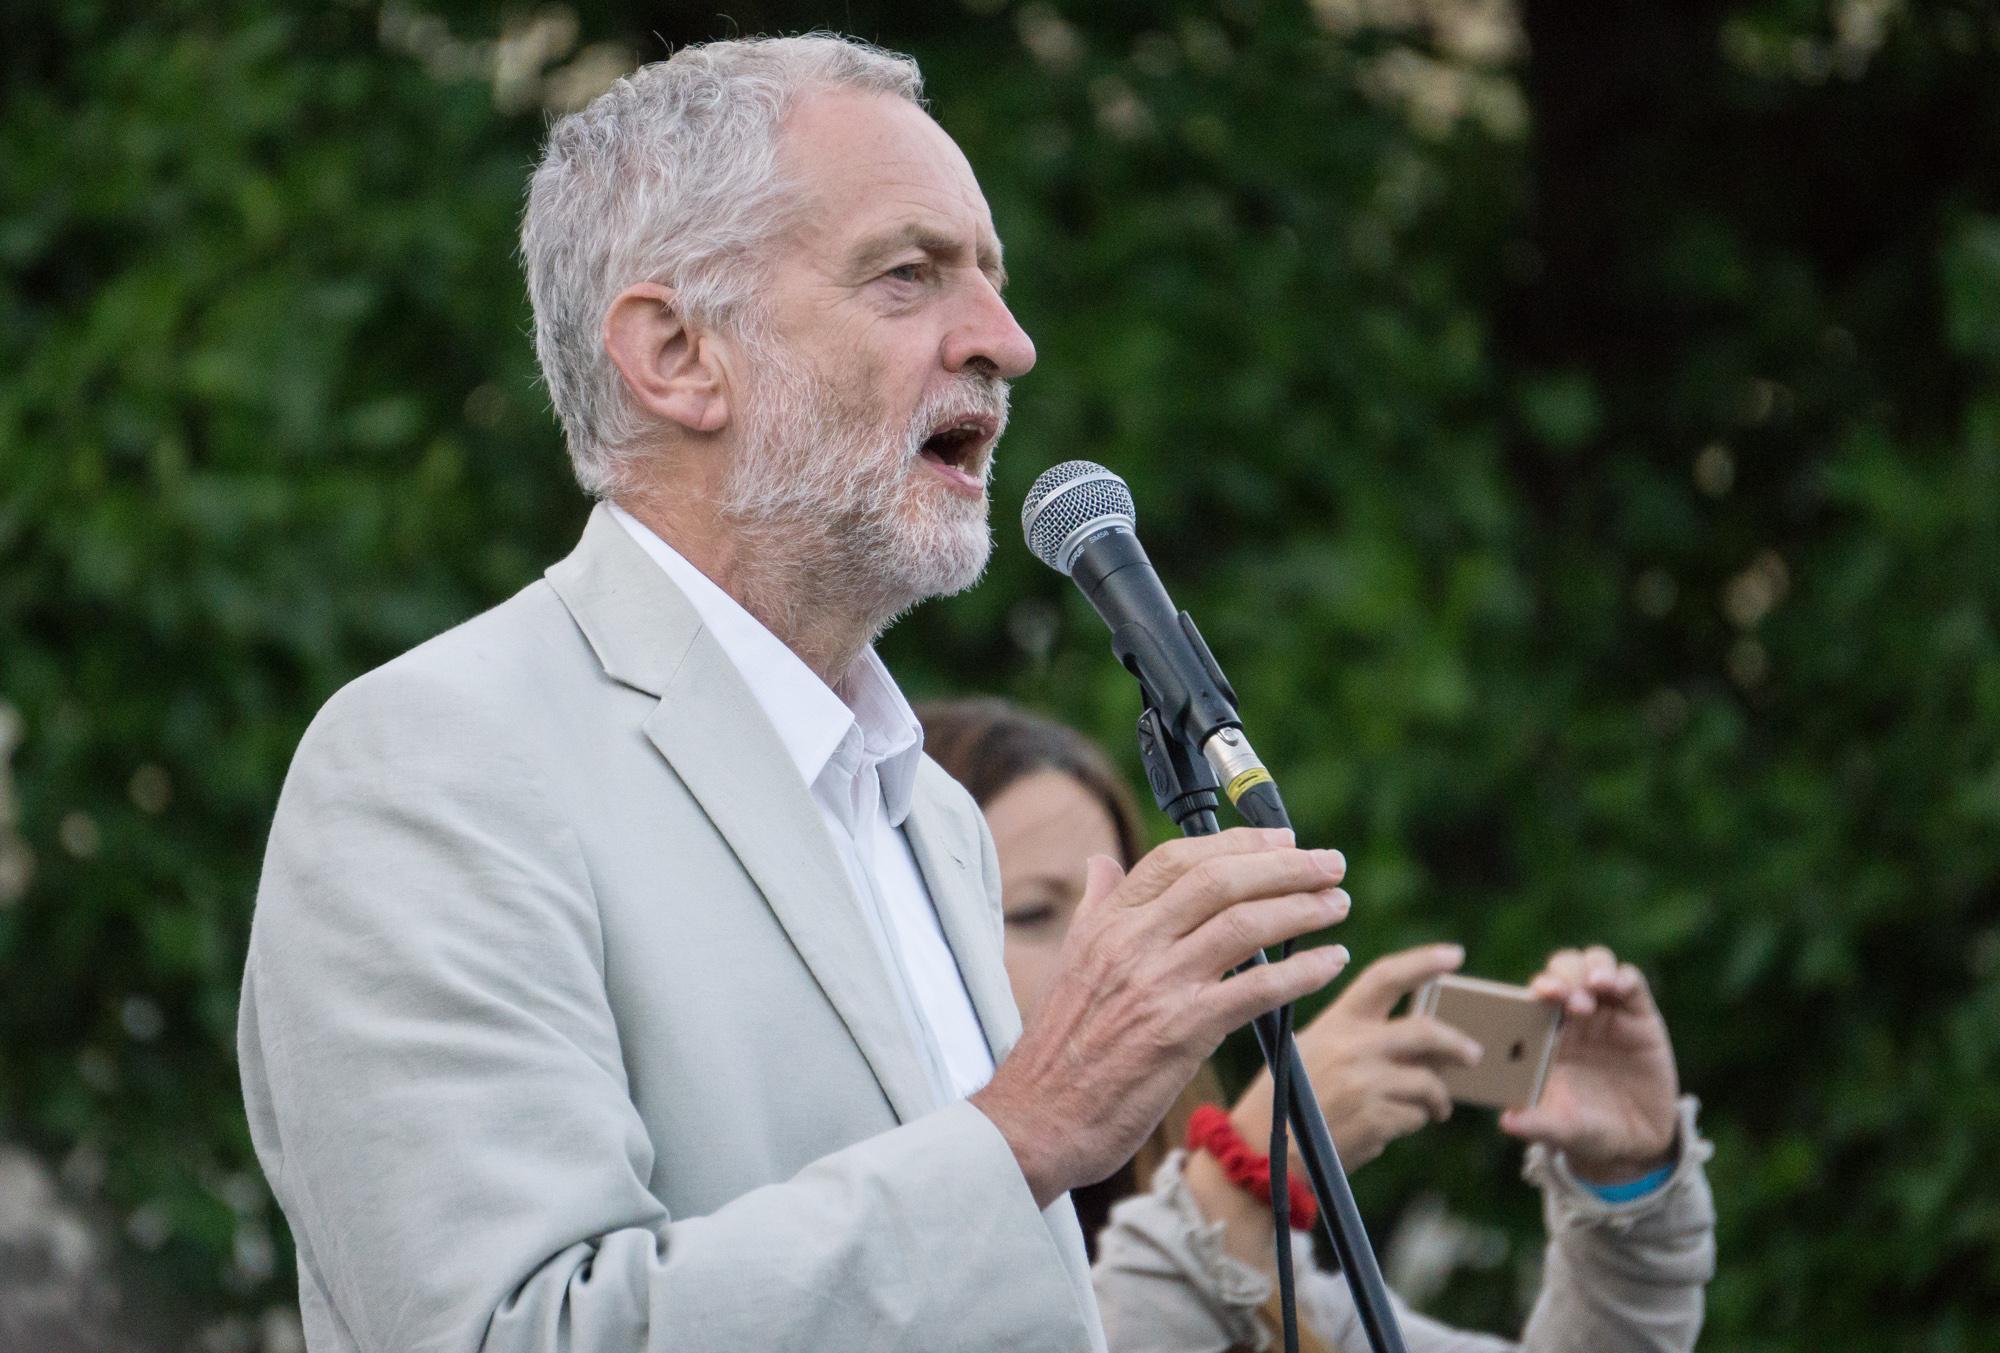 Jeremy Corbyn. Credit: Paul New via Wikimedia Commons.